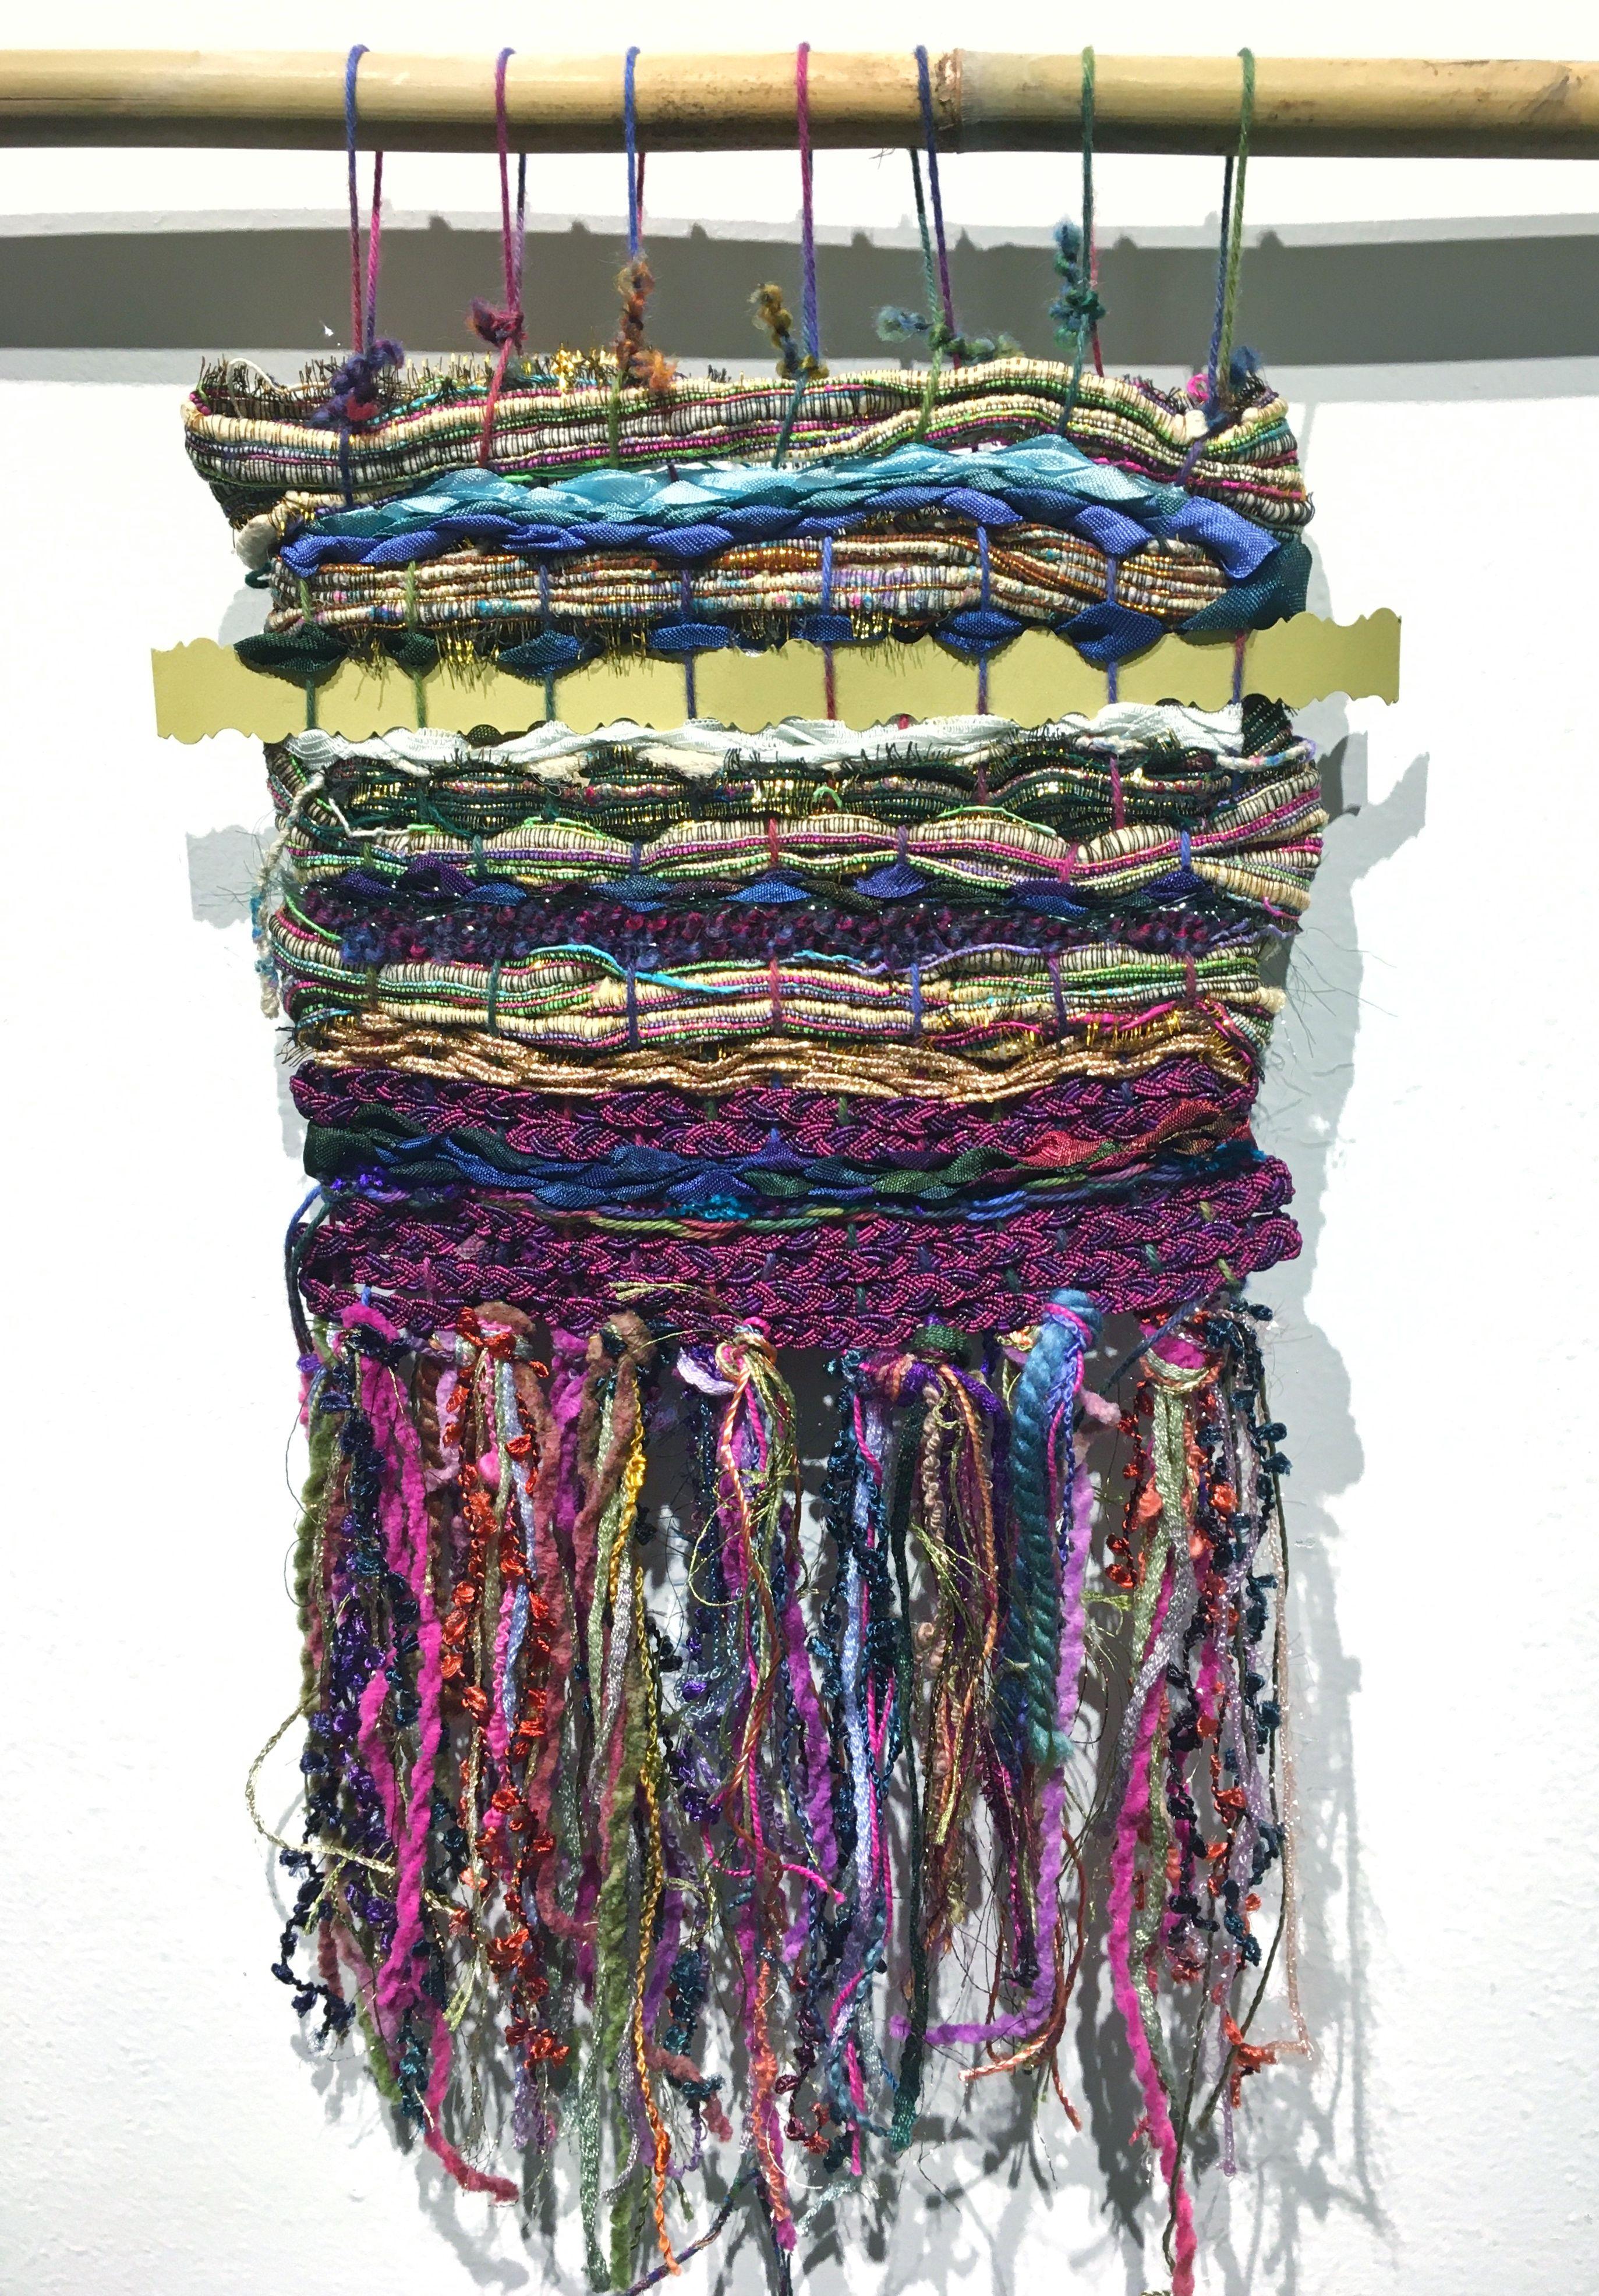 Art of Healing: Weaving